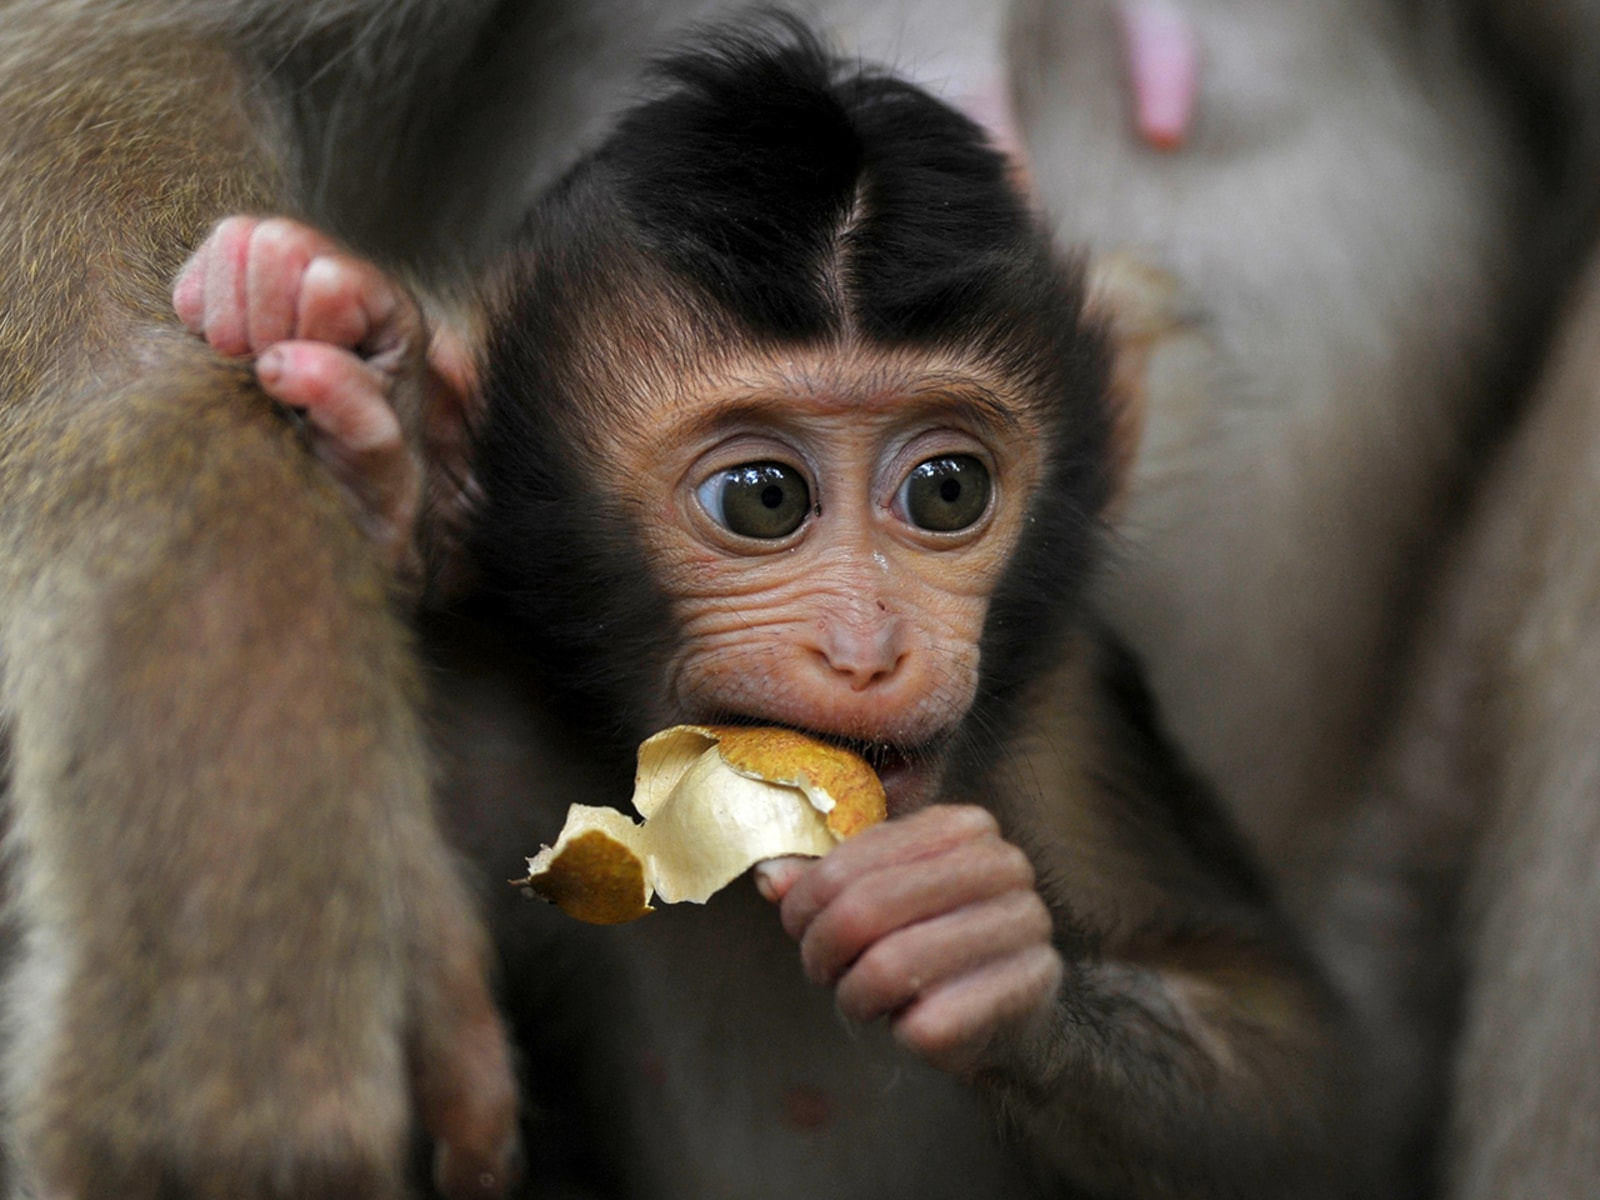 Image: MALAYSIA-ANIMAL-MONKEY